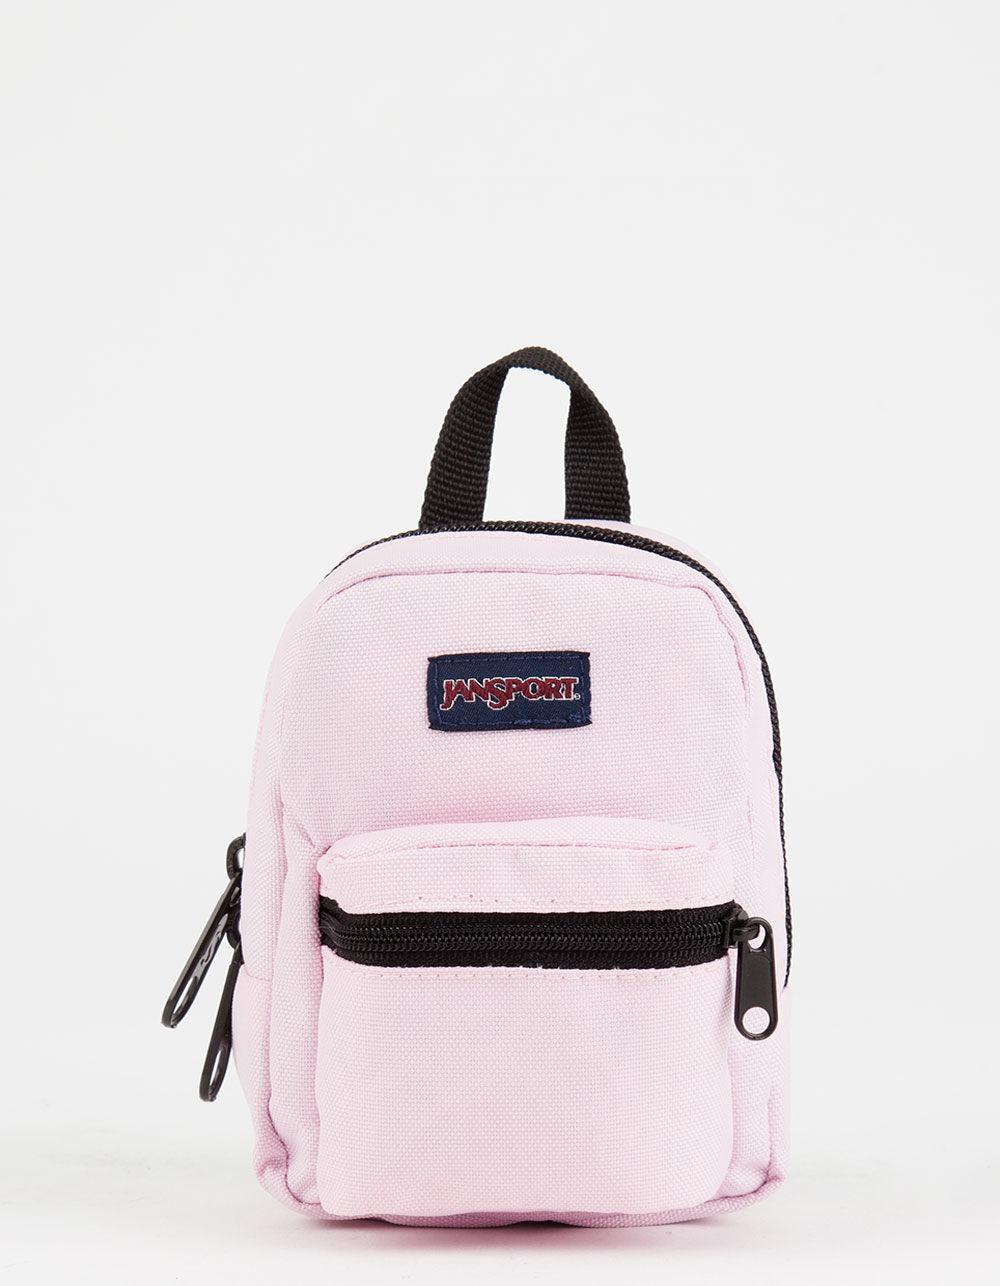 Jansport Disney Lil Break Pouch Blooming Minnie Daftar Harga Tempat Aksesoris Right White Bow Dot Backpack Source Mochila Super Fx Branco